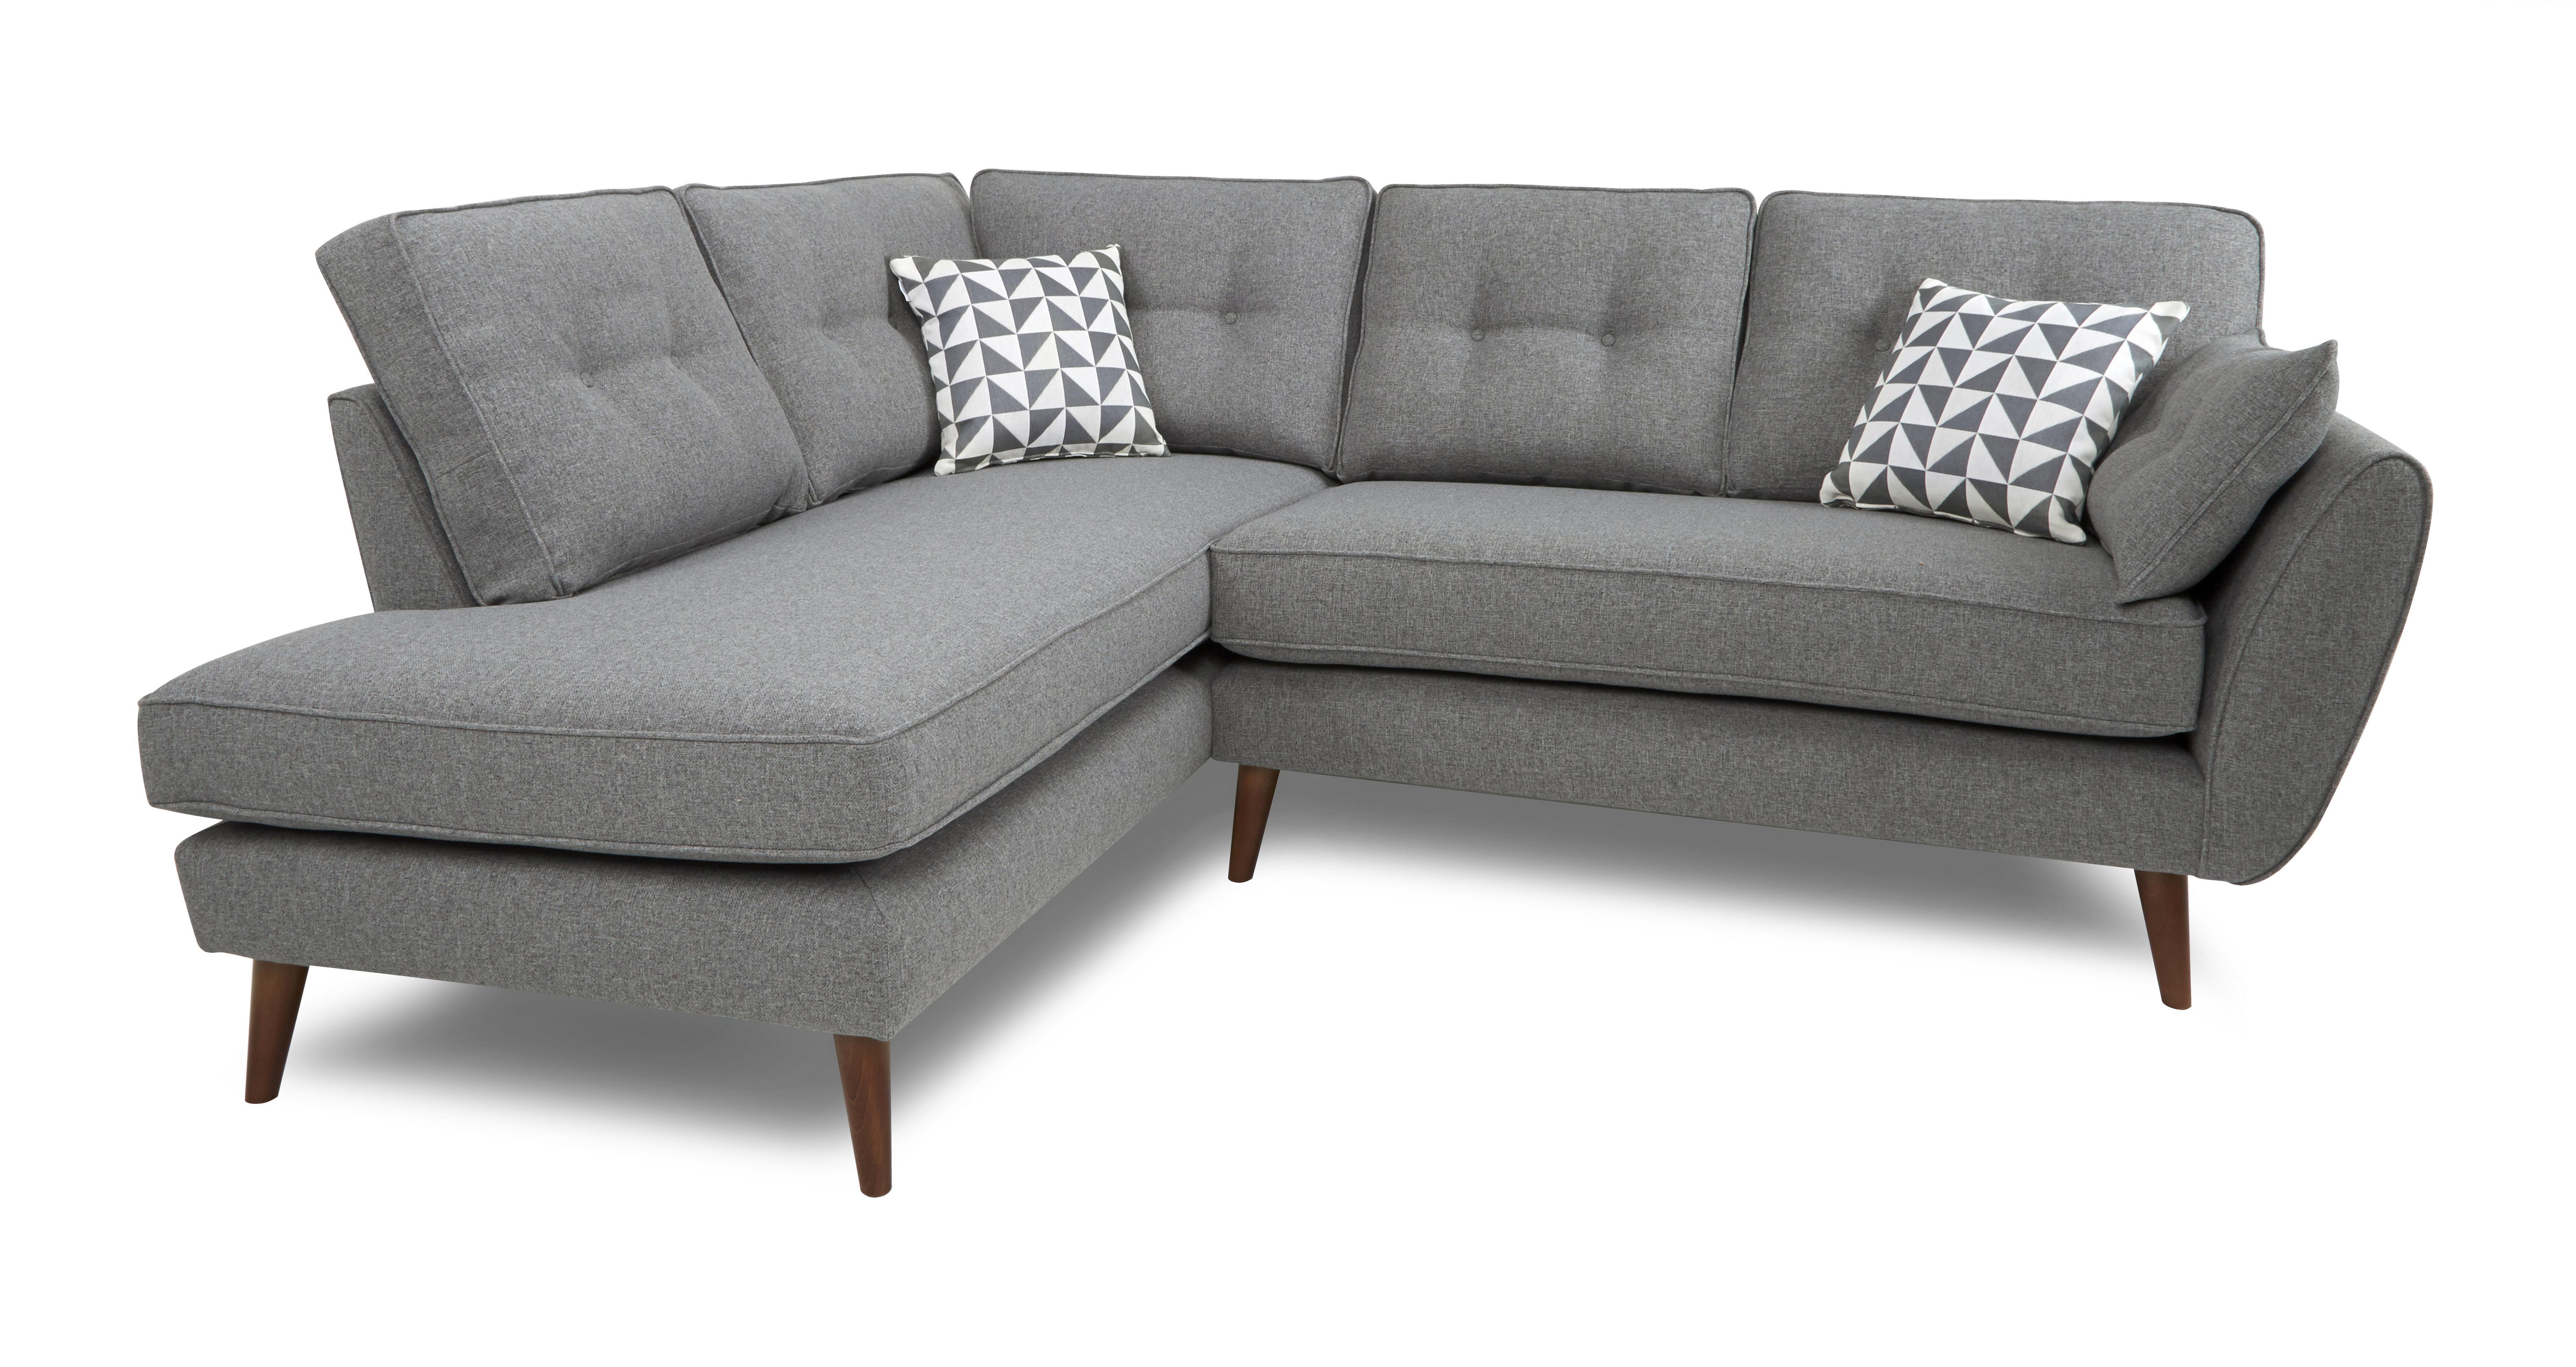 Zinc 4 Seater Sofa Dfs Savae Org